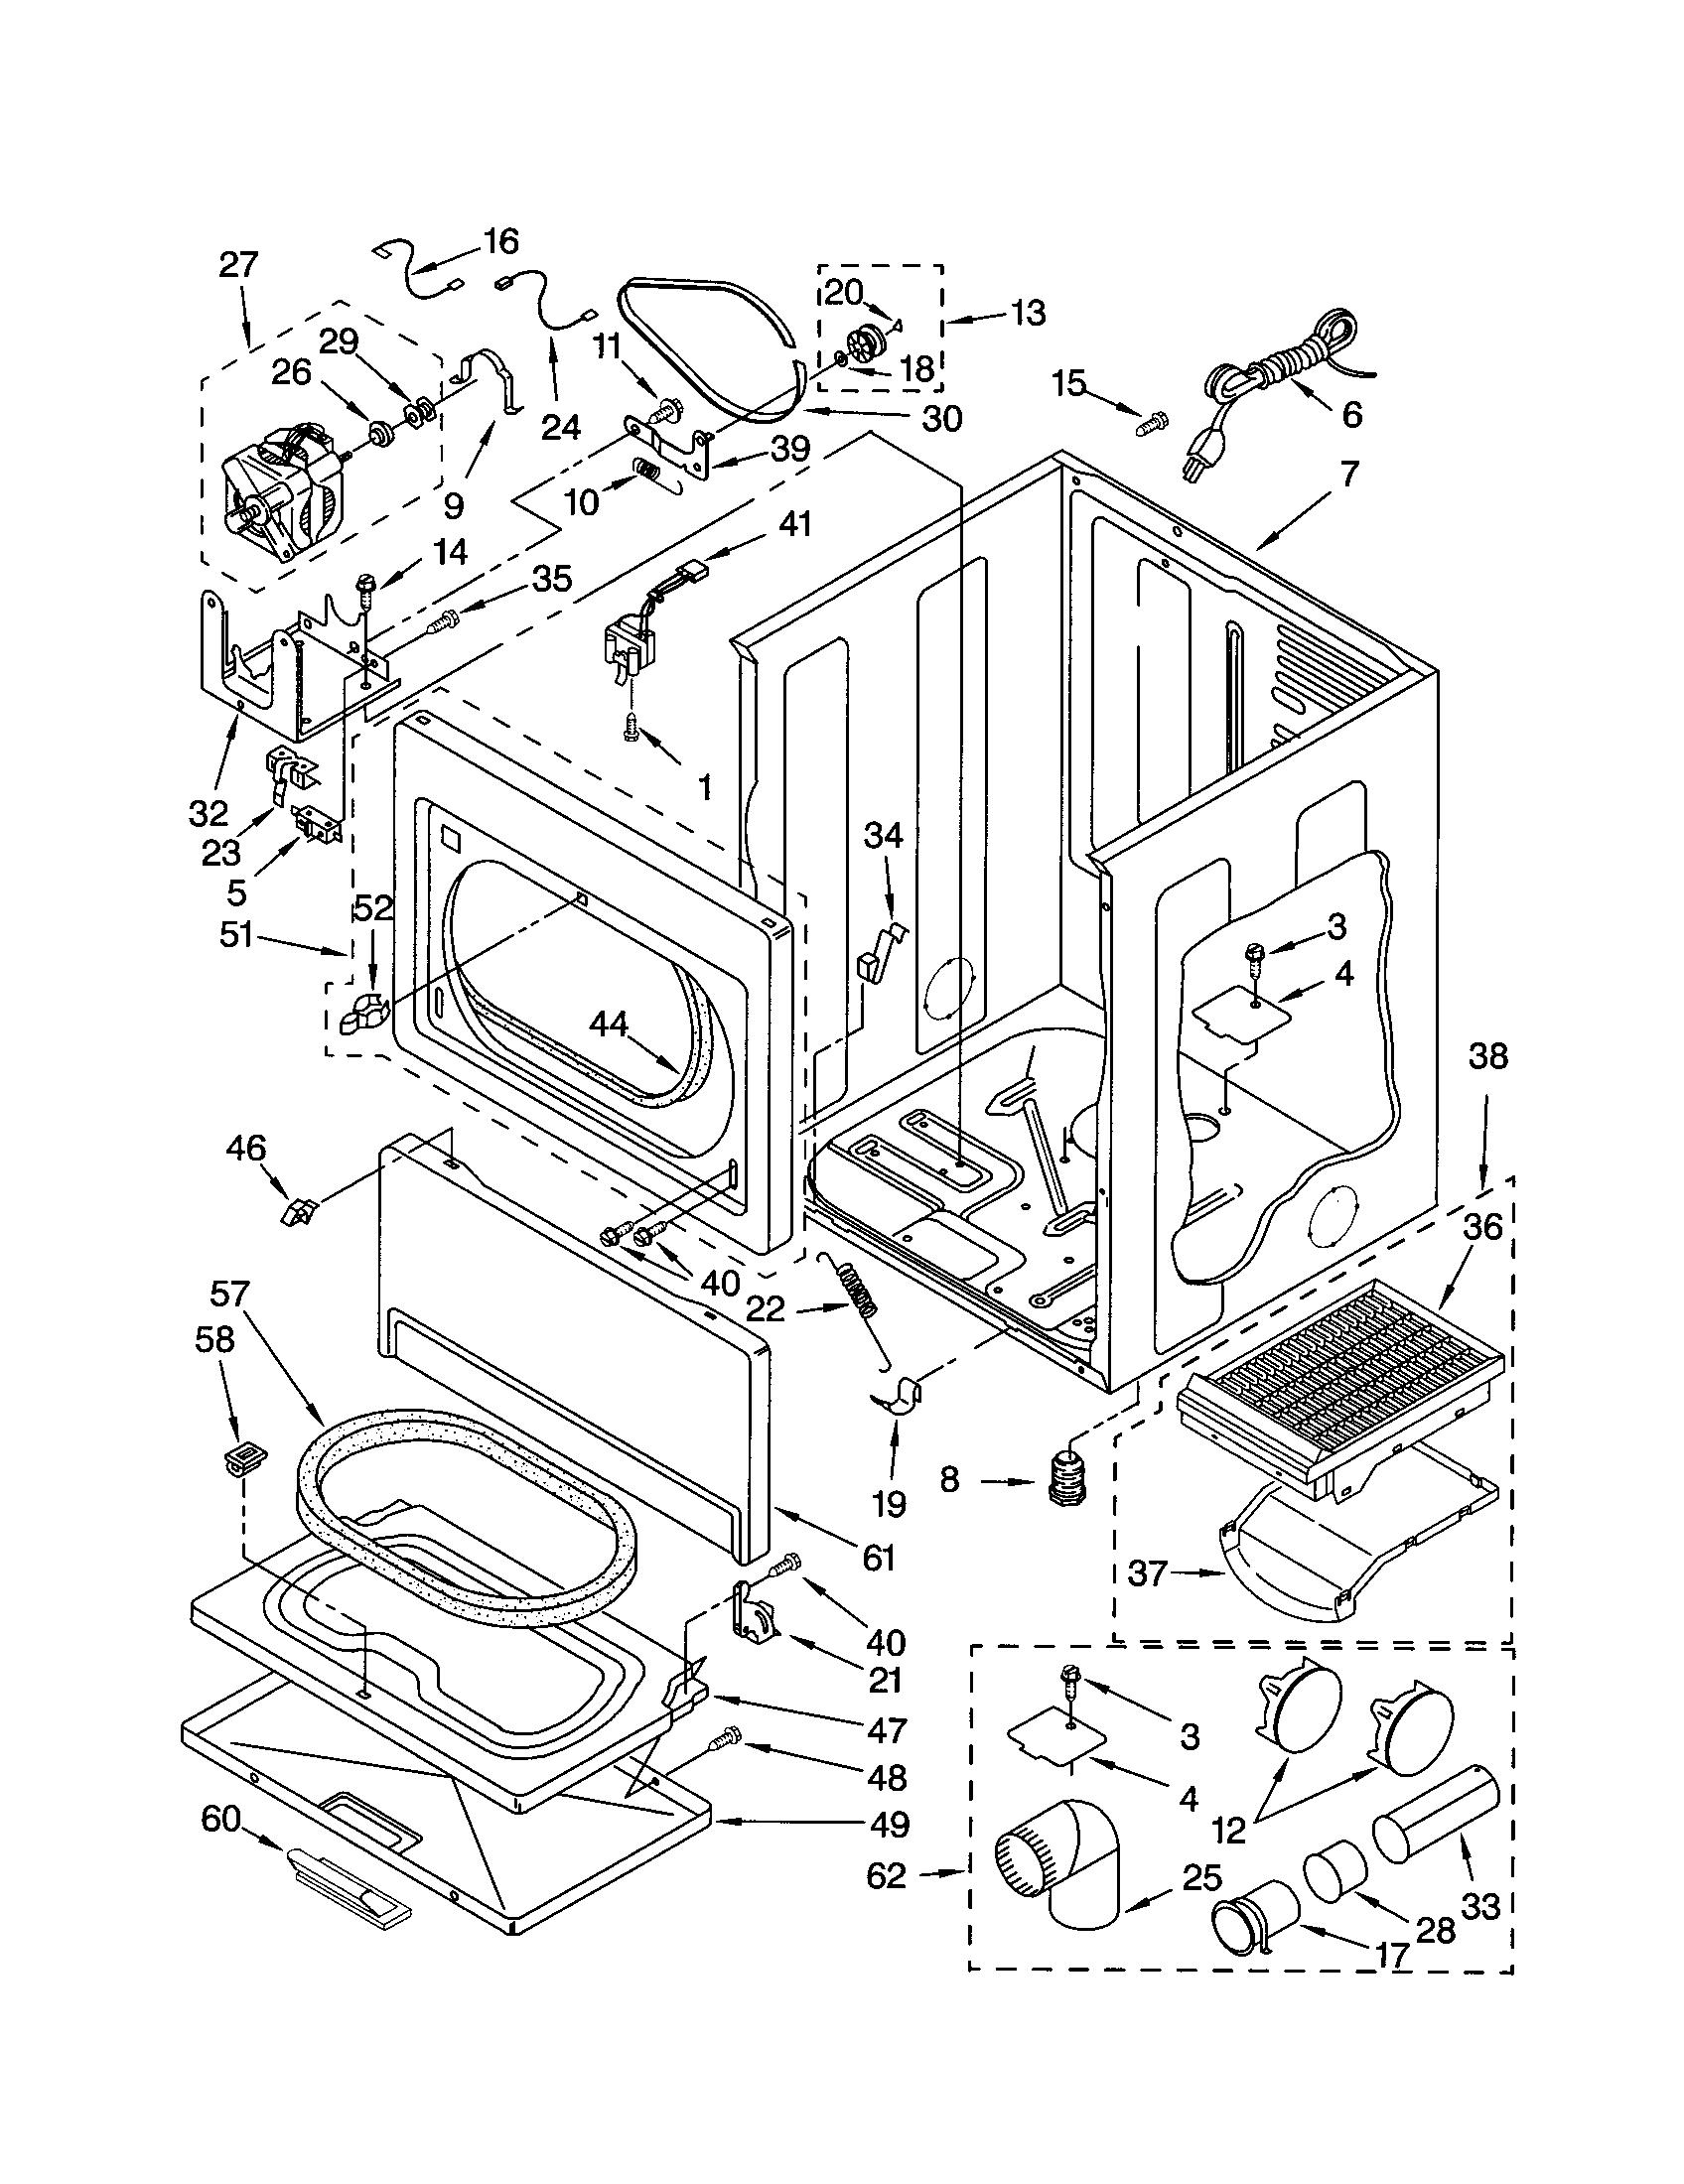 hight resolution of kenmore elite heating element wiring diagram